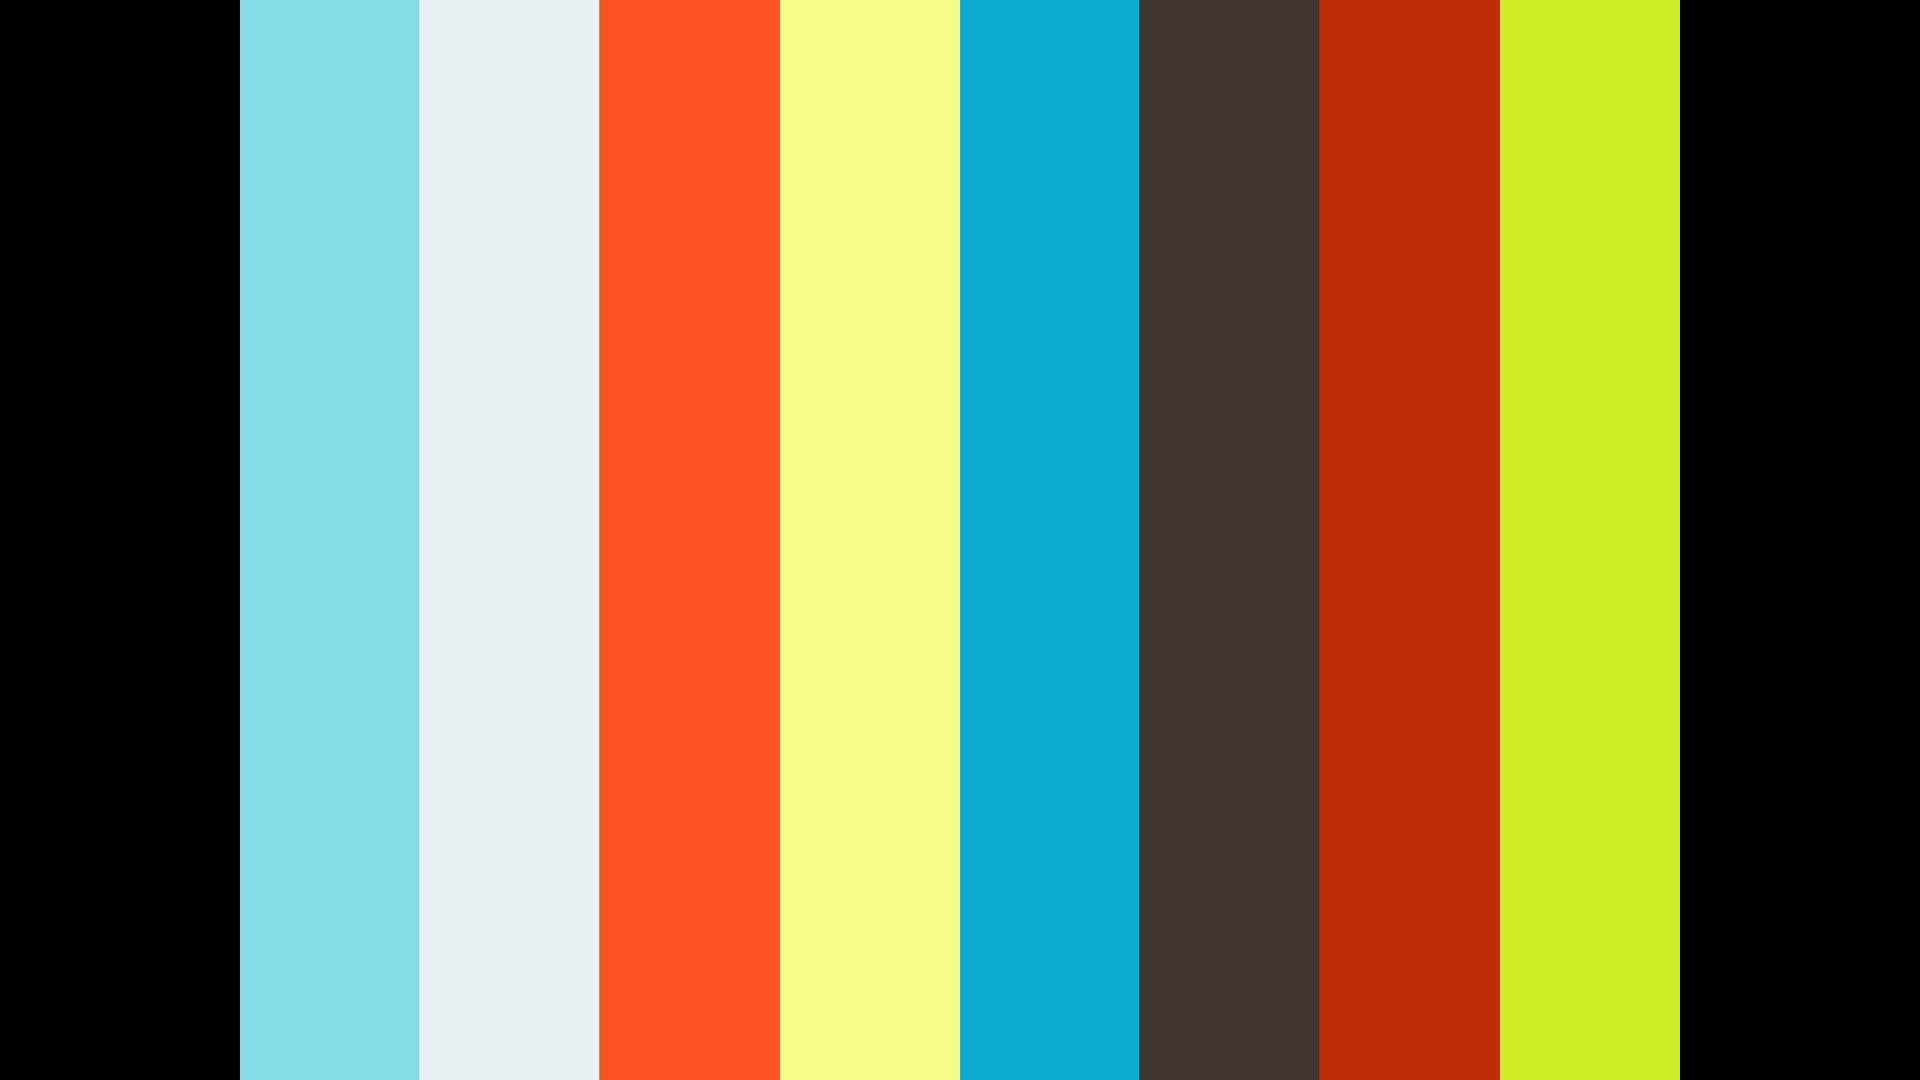 09_23_2020 - Spades - 60bb BTN 3b vs CO RFI Part 1